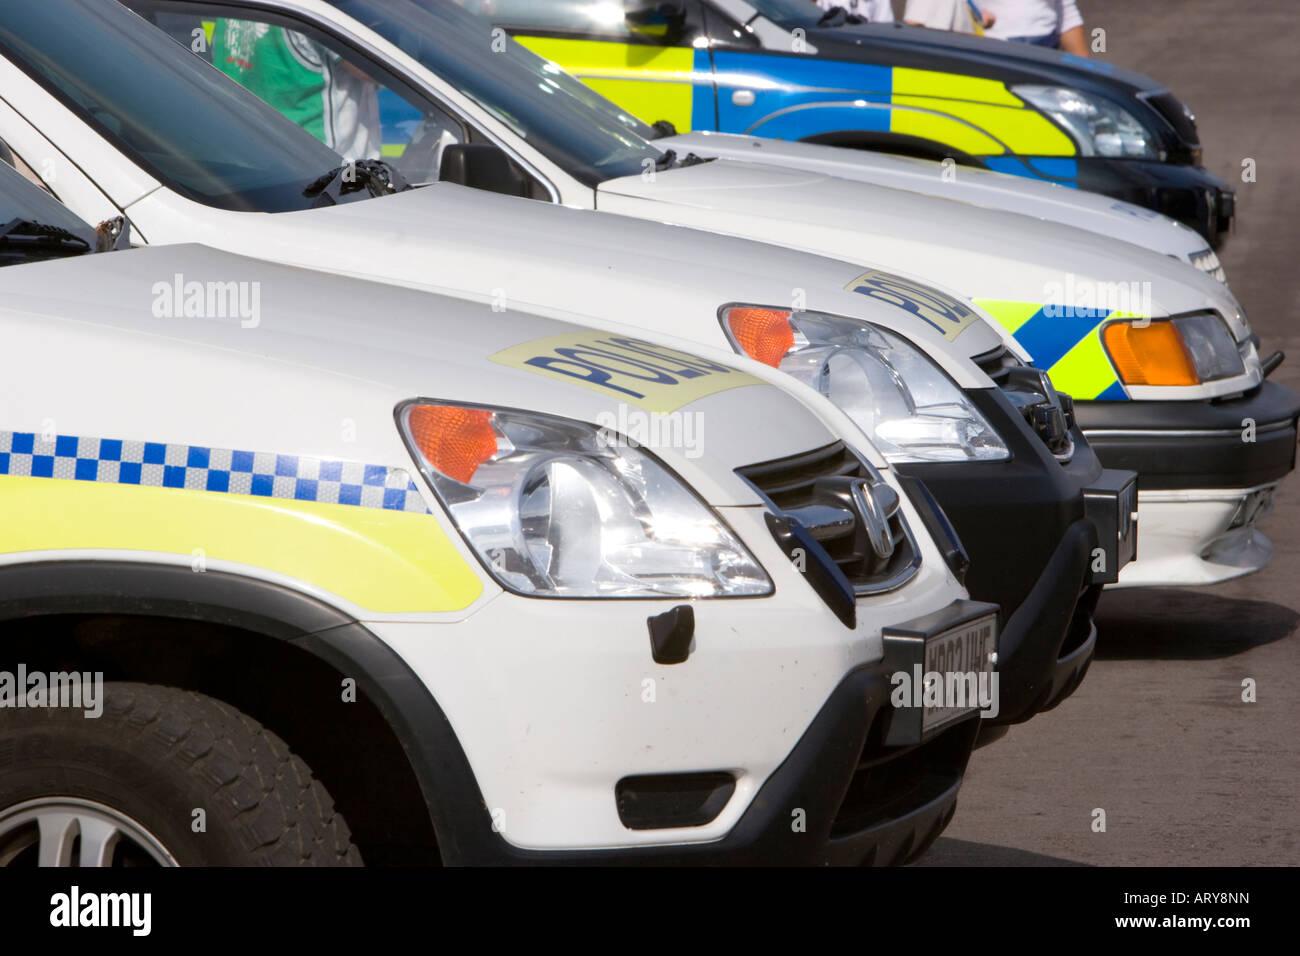 Police vehicle line up - Stock Image